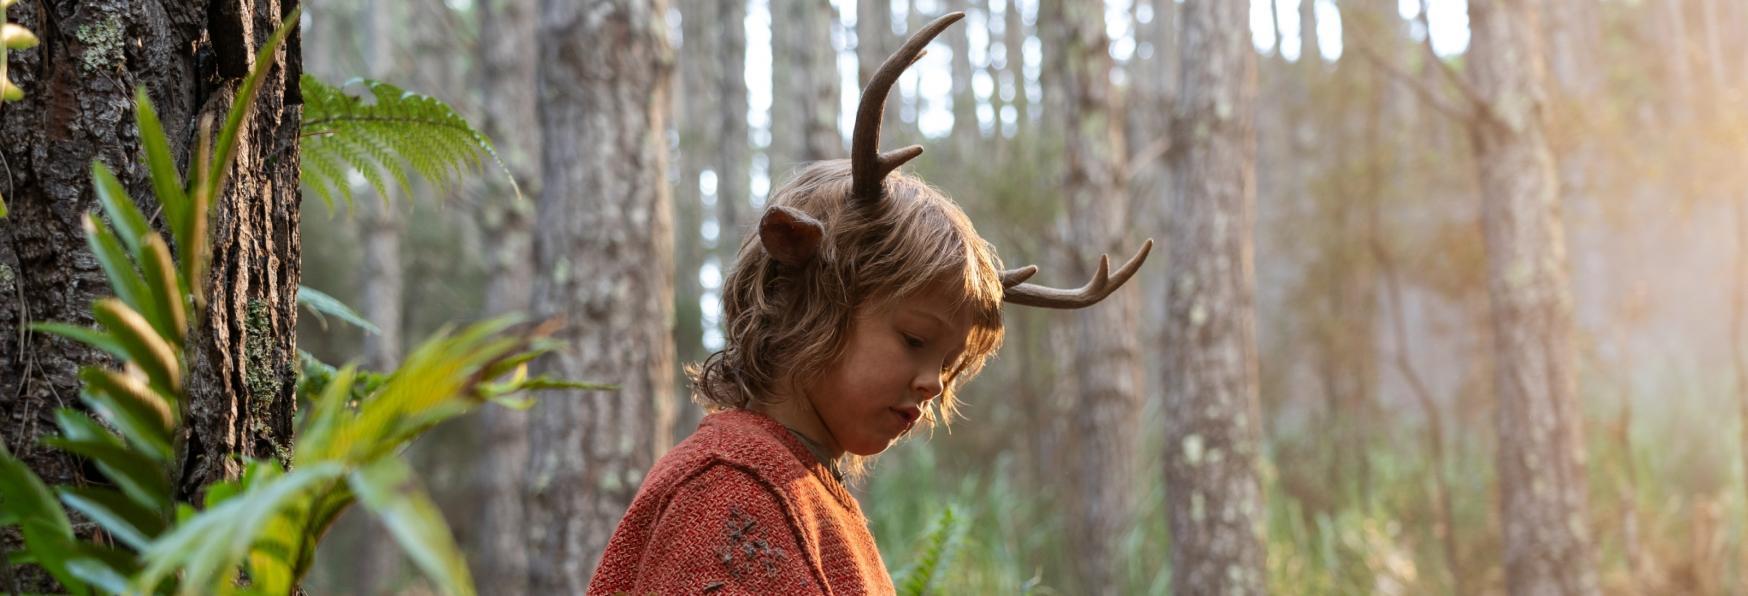 Sweet Tooth: l'Influenza di Twin Peaks sulla Serie TV di Netflix